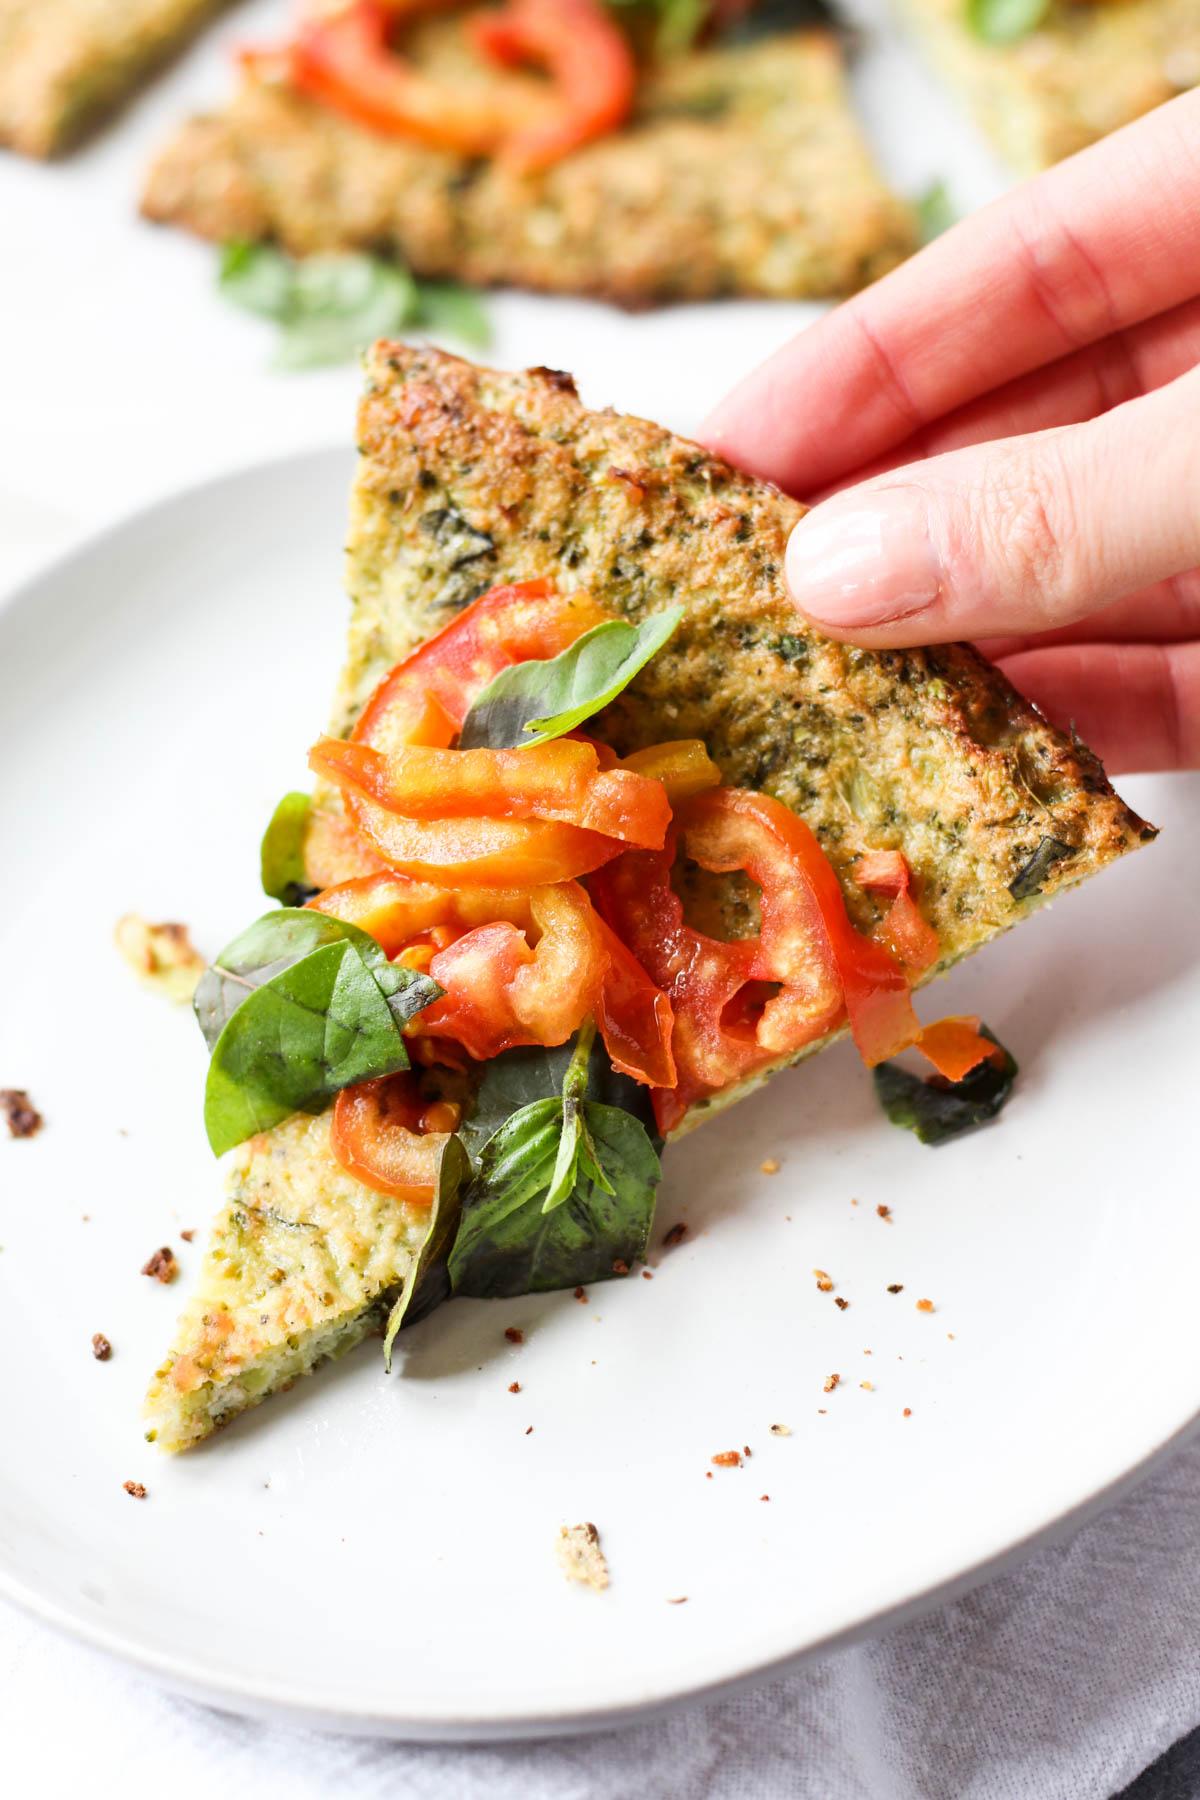 Hand holding slice of broccoli crust pizza.